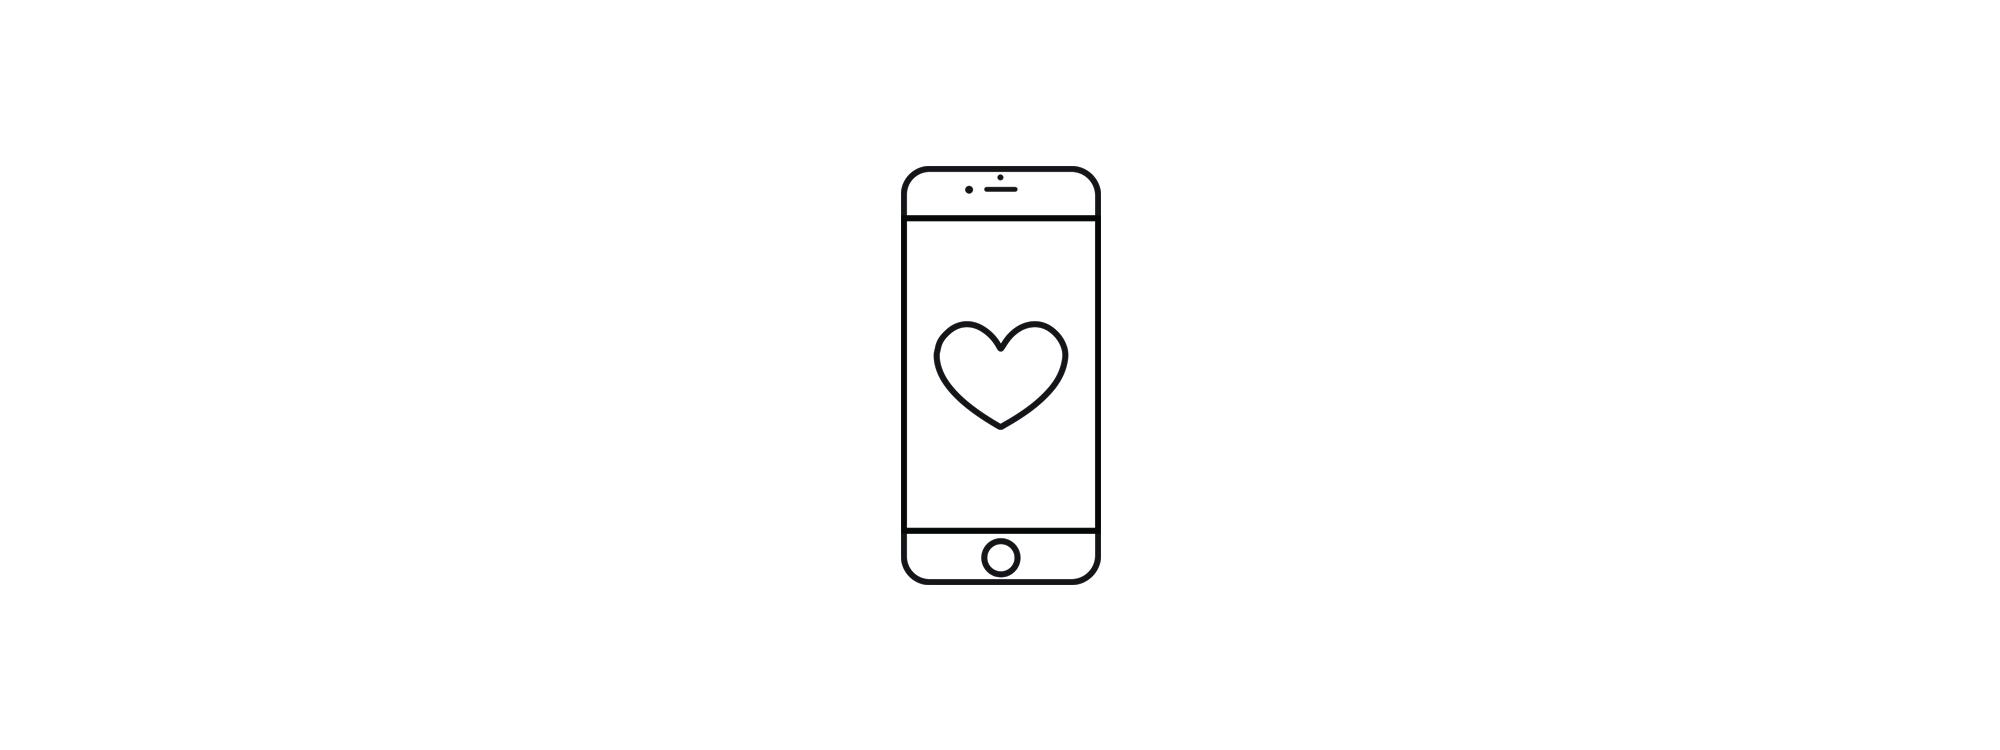 iphone_sized.jpg